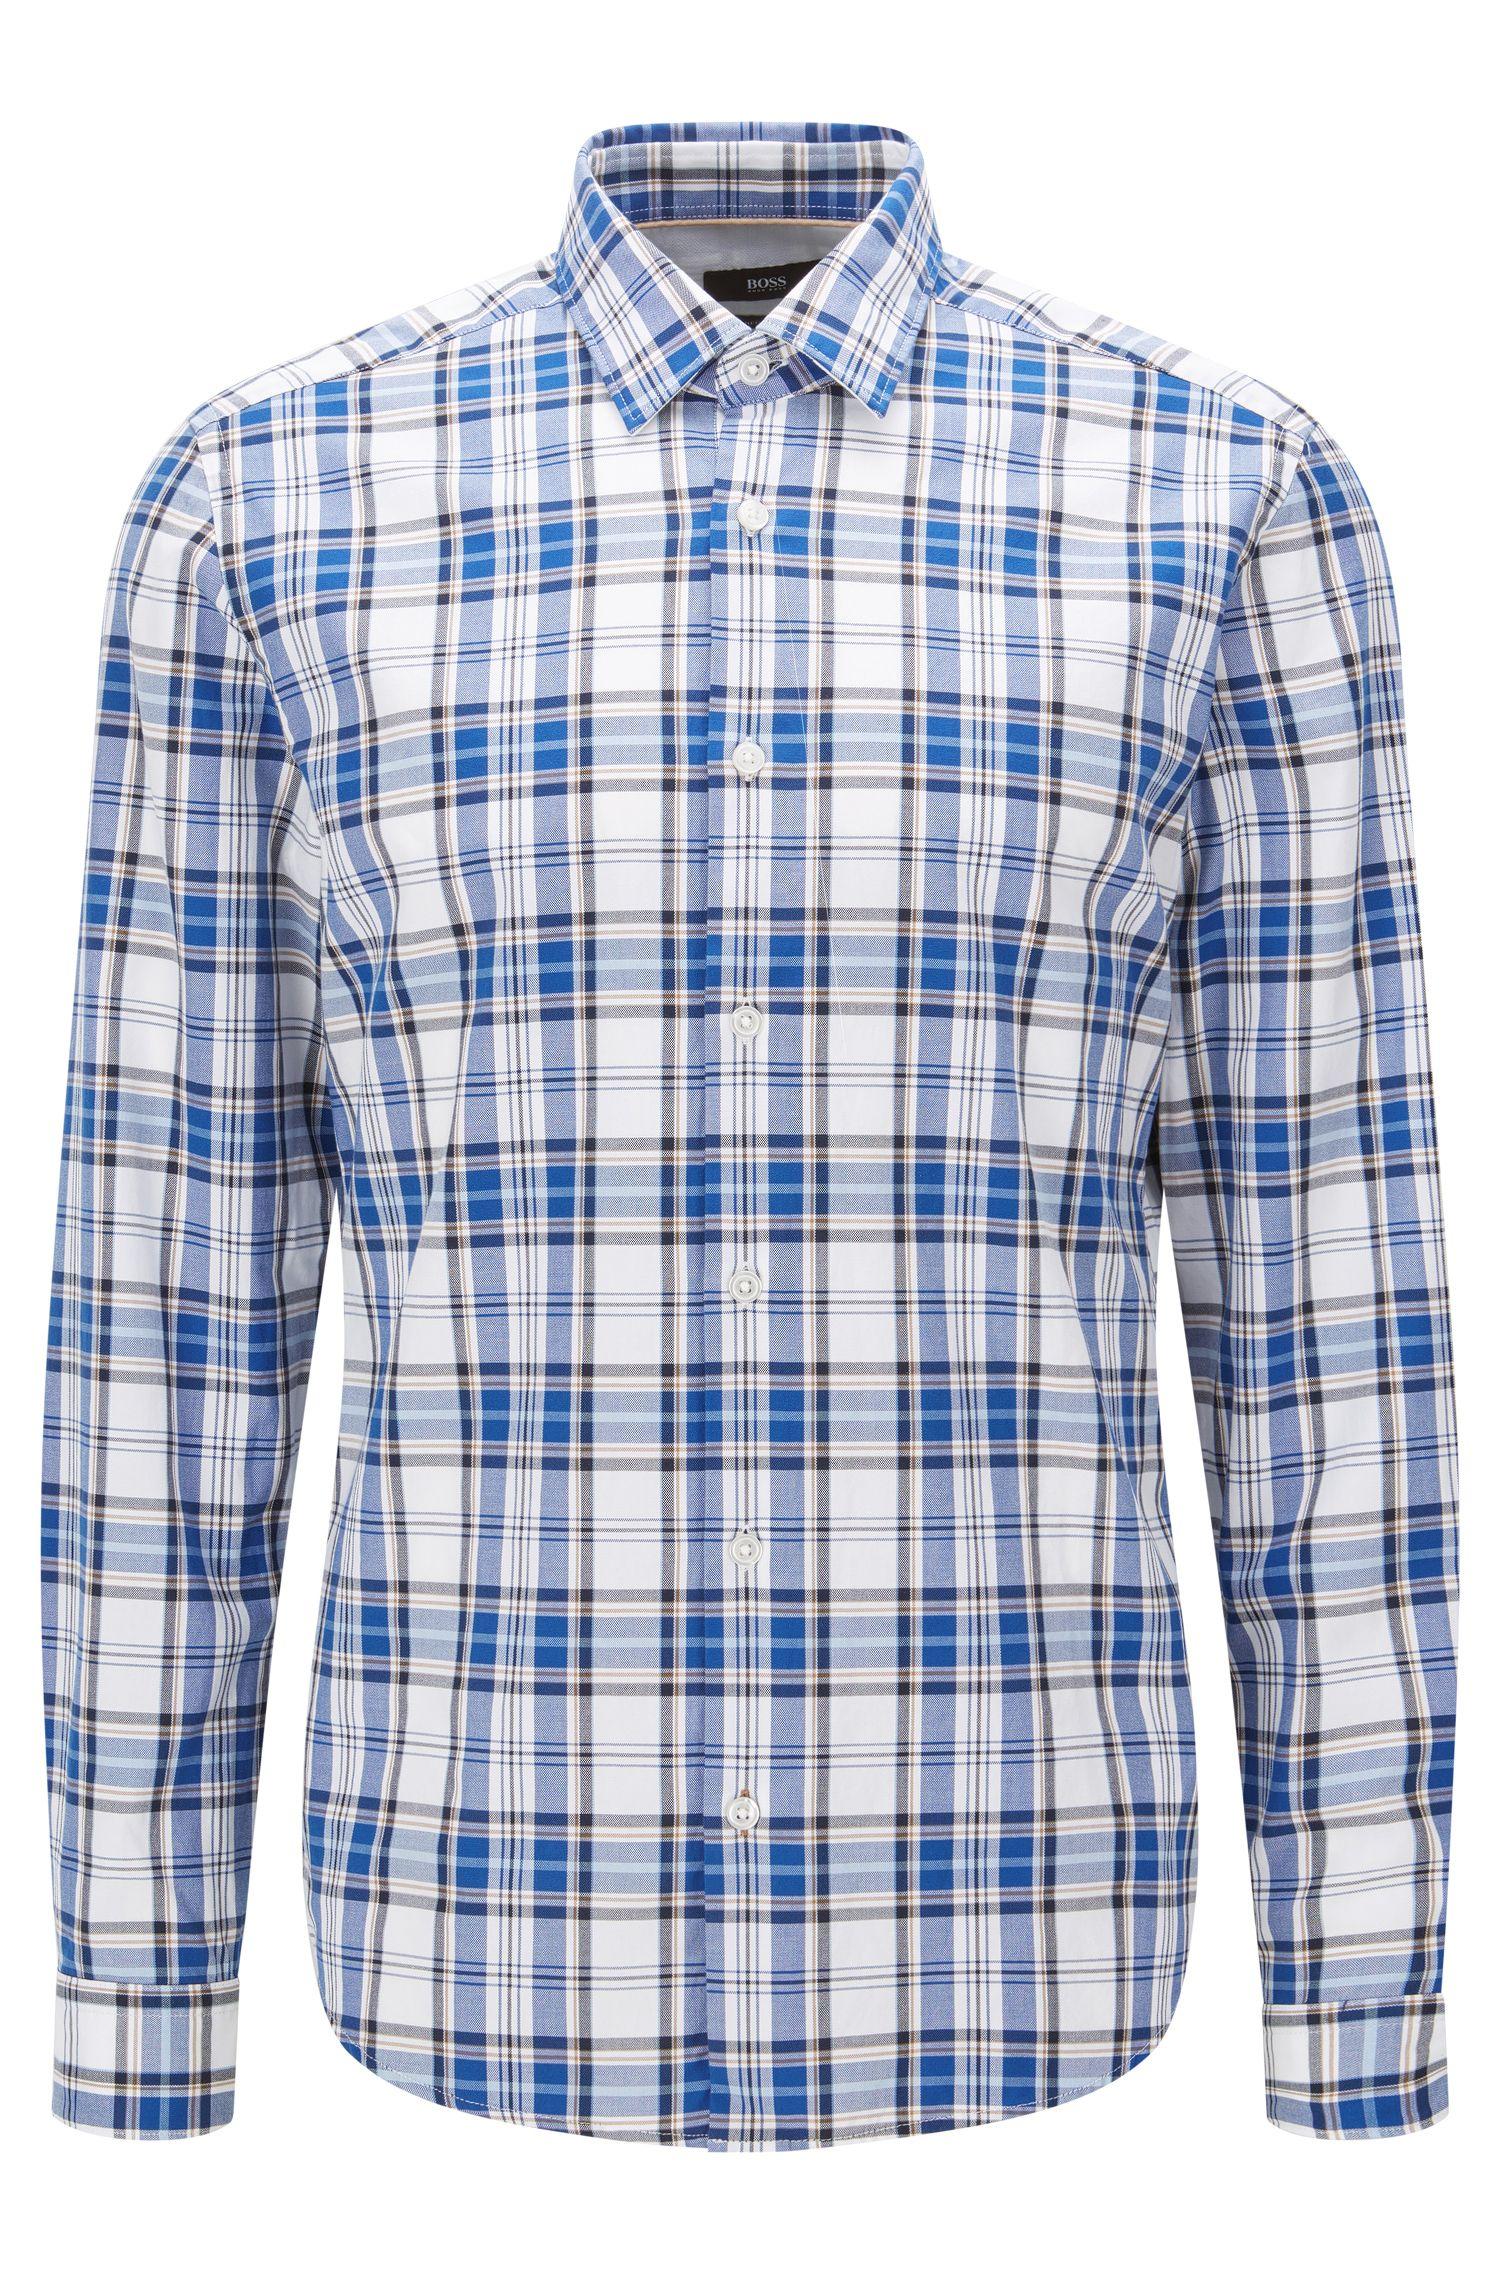 'Lance' | Regular Fit, Plaid Cotton Button Down Shirt